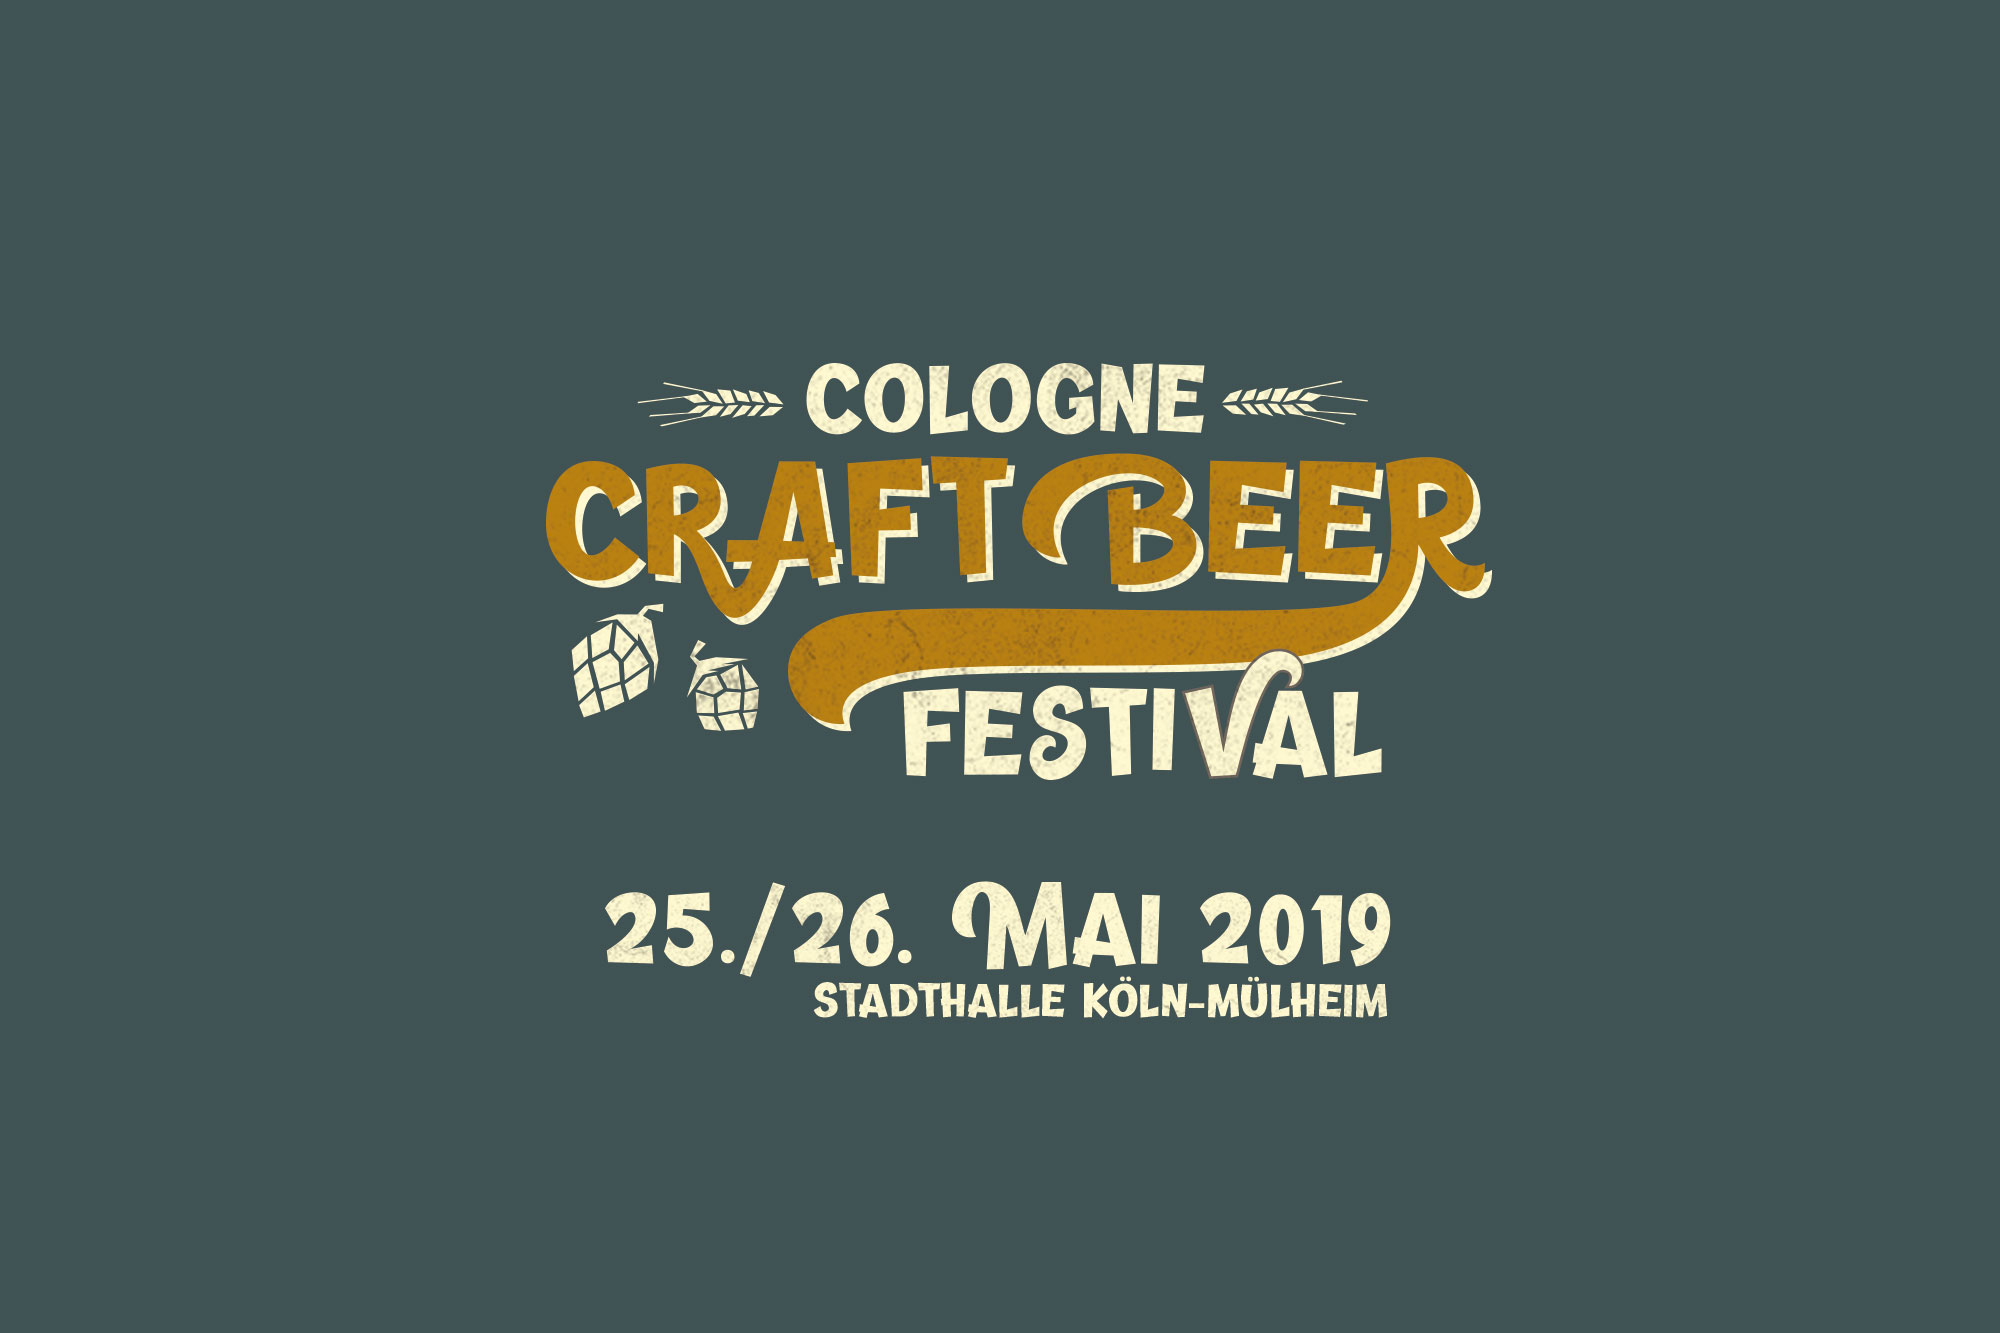 https://www.craftbeer-festival.cologne/images/landing/craftbeer-cologne-logo.png